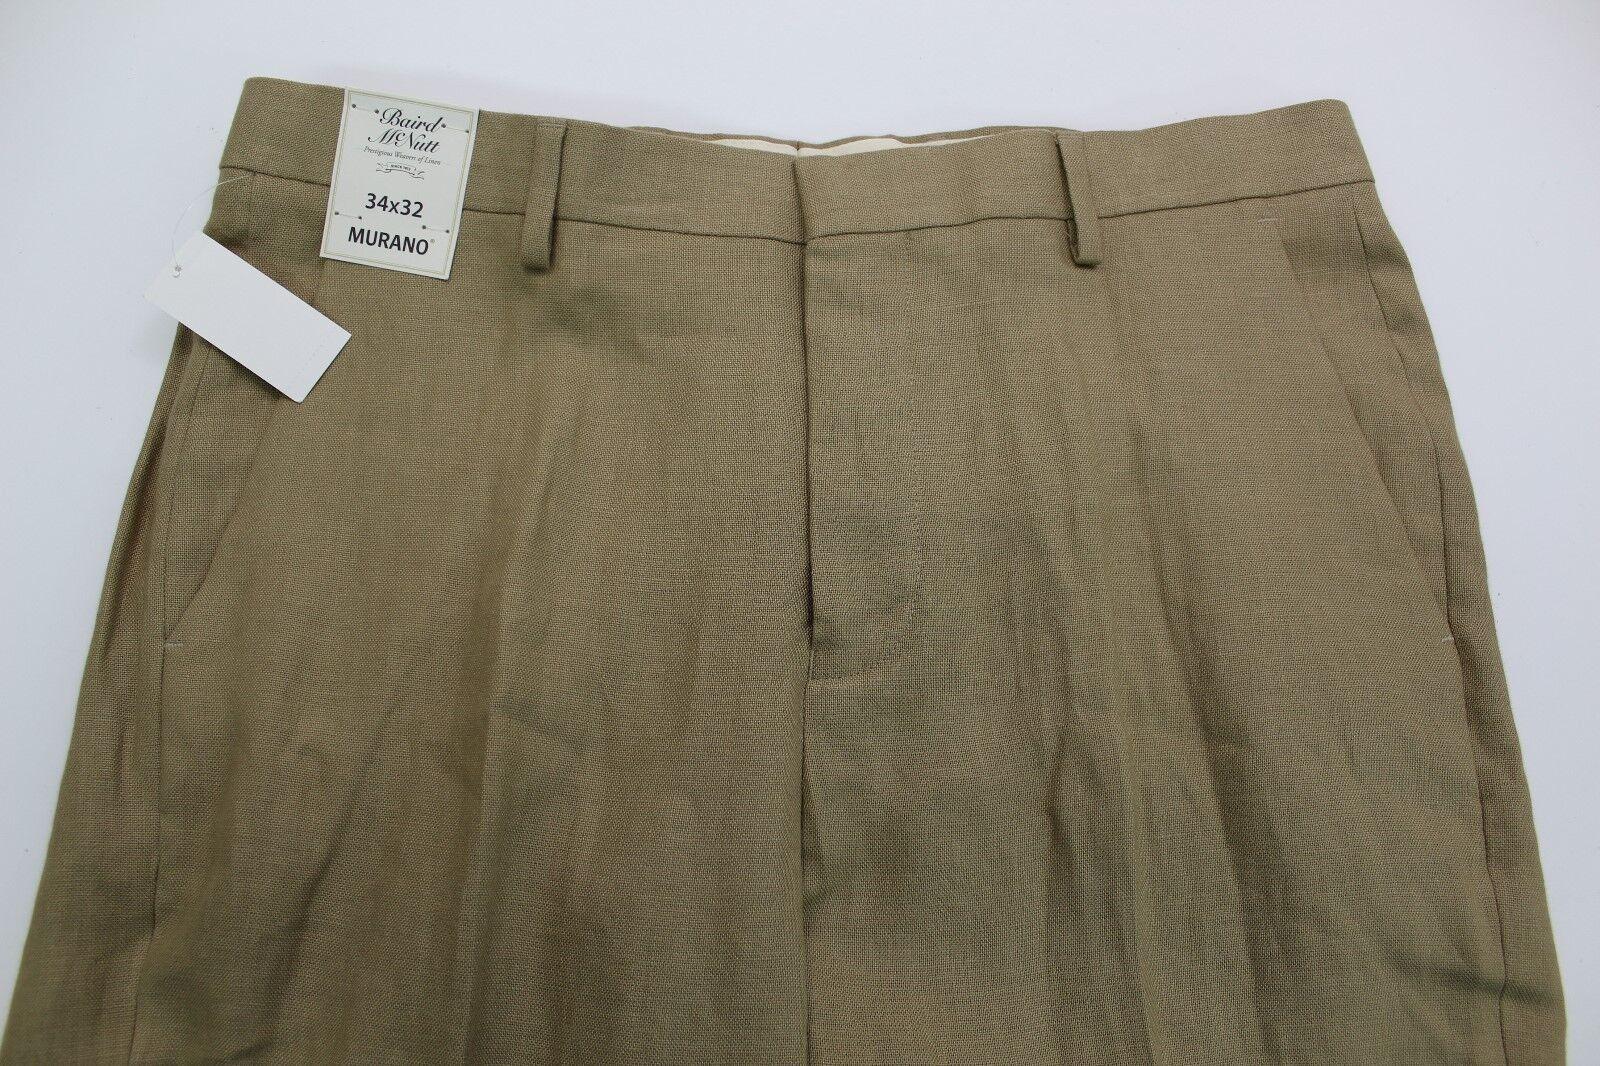 Men's MURANO Walnut Tan Khaki LINEN Dress Pants 34x32 NEW NWT Baird McNutt